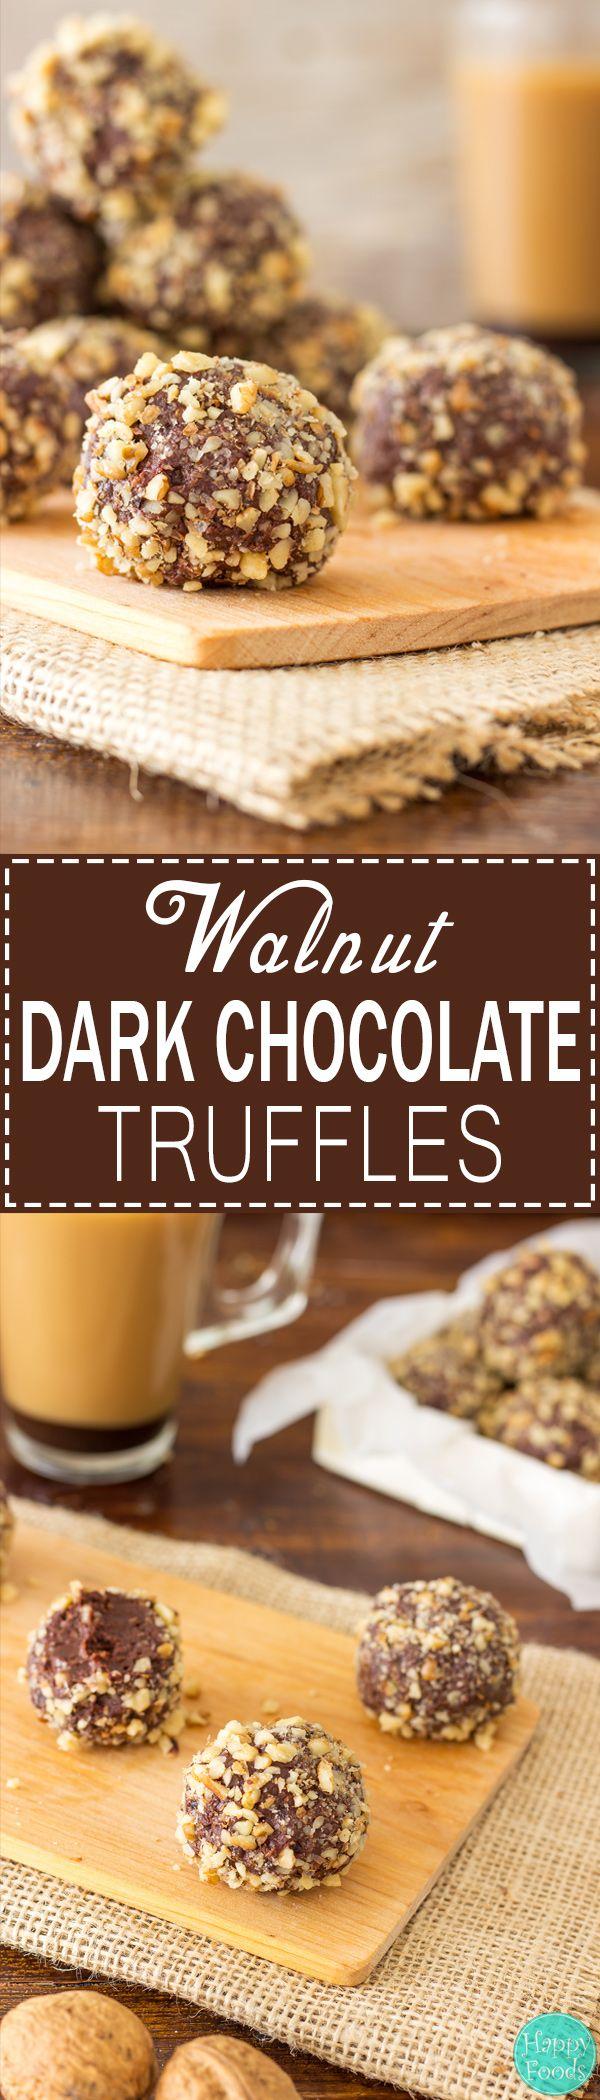 Walnut Dark Chocolate Truffles - Super easy no bake dessert recipe! Best sweet treats. Only 5 ingredients - Dark Chocolate, Caramel (Dulce de Leche), Walnuts, Butter and Dried Fruit! | happyfoodstube.com